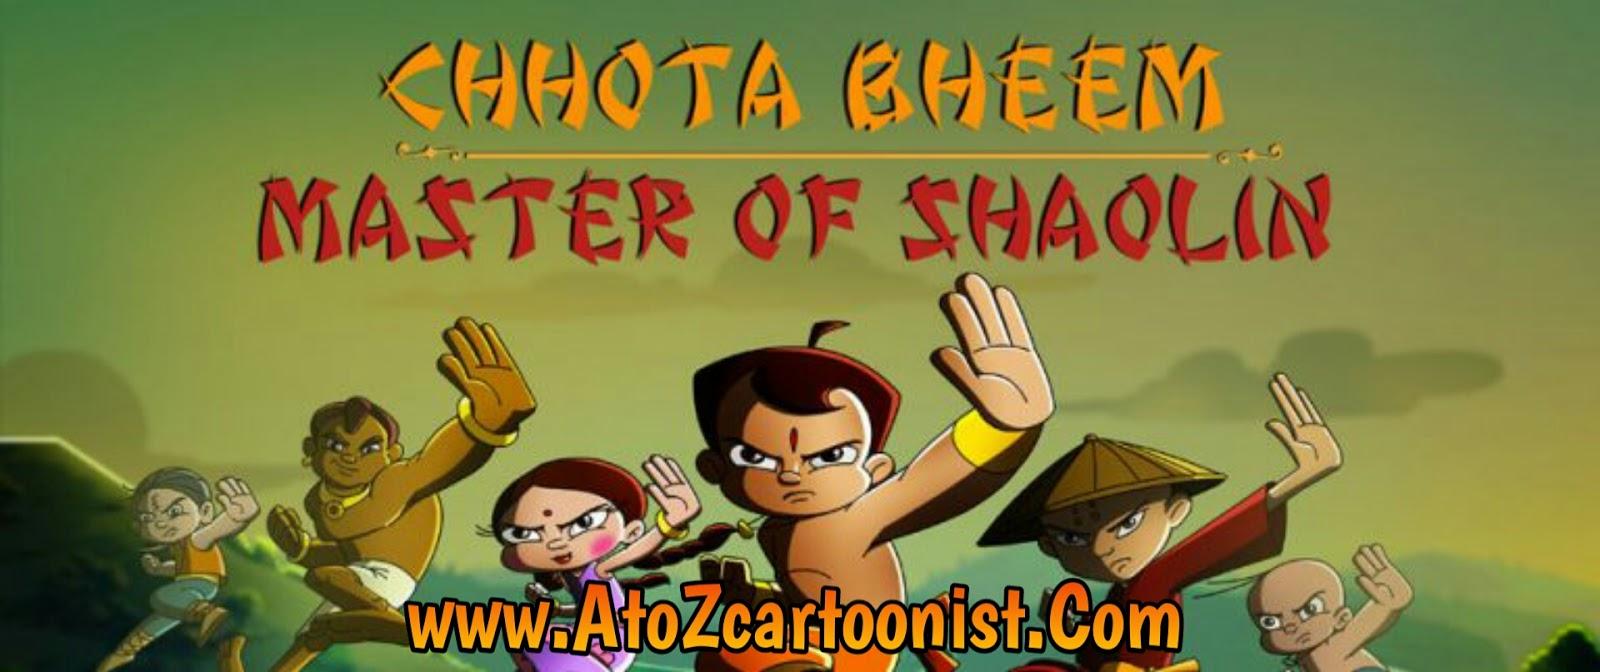 chhota bheem full movie download in tamil